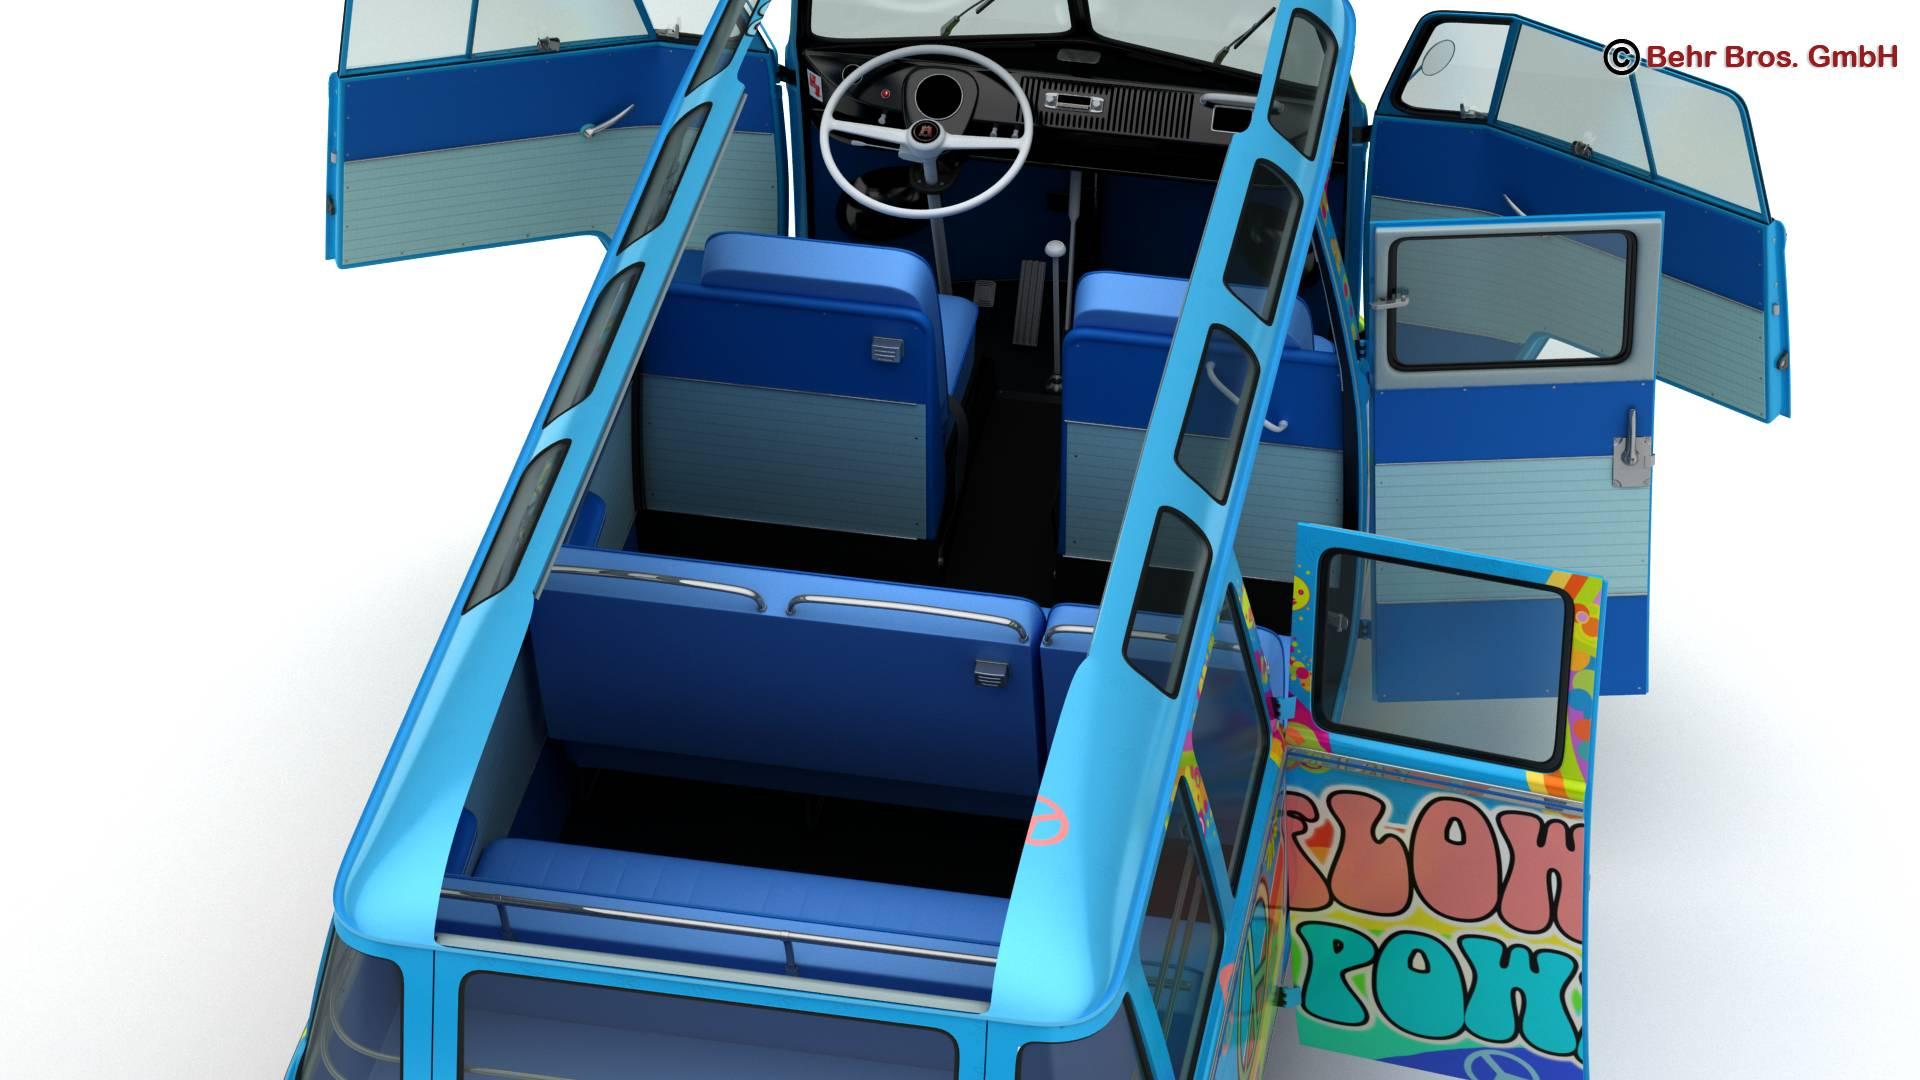 volkswagen type 2 samba 1963 hippie 3d model 3ds max fbx c4d lwo ma mb obj 217253